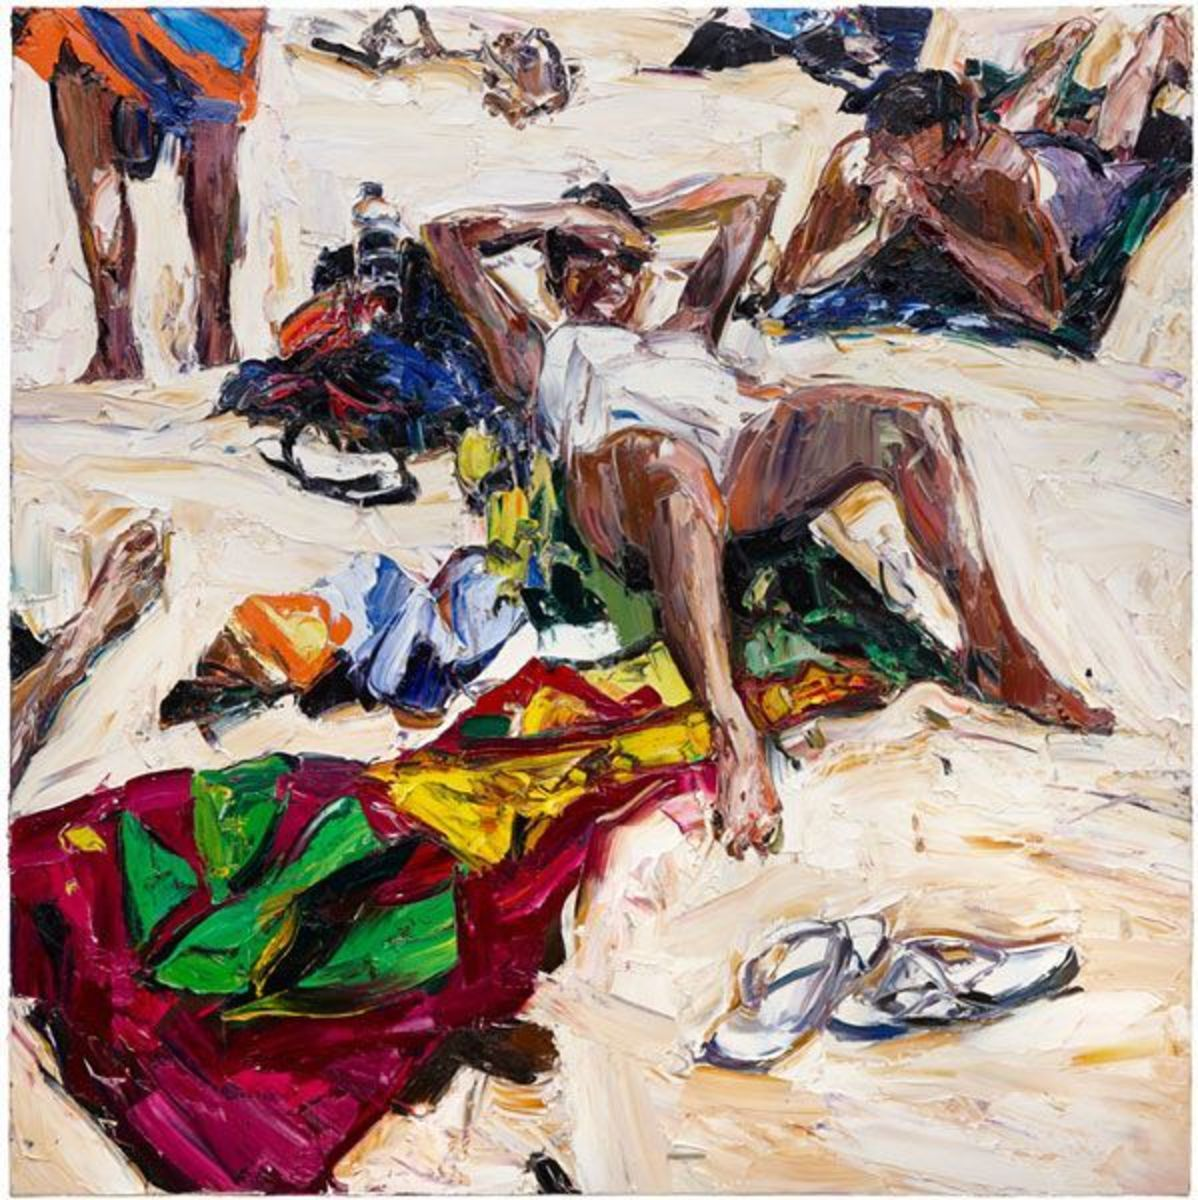 Beach life (towels, thongs, waterbottle, feet and figures)